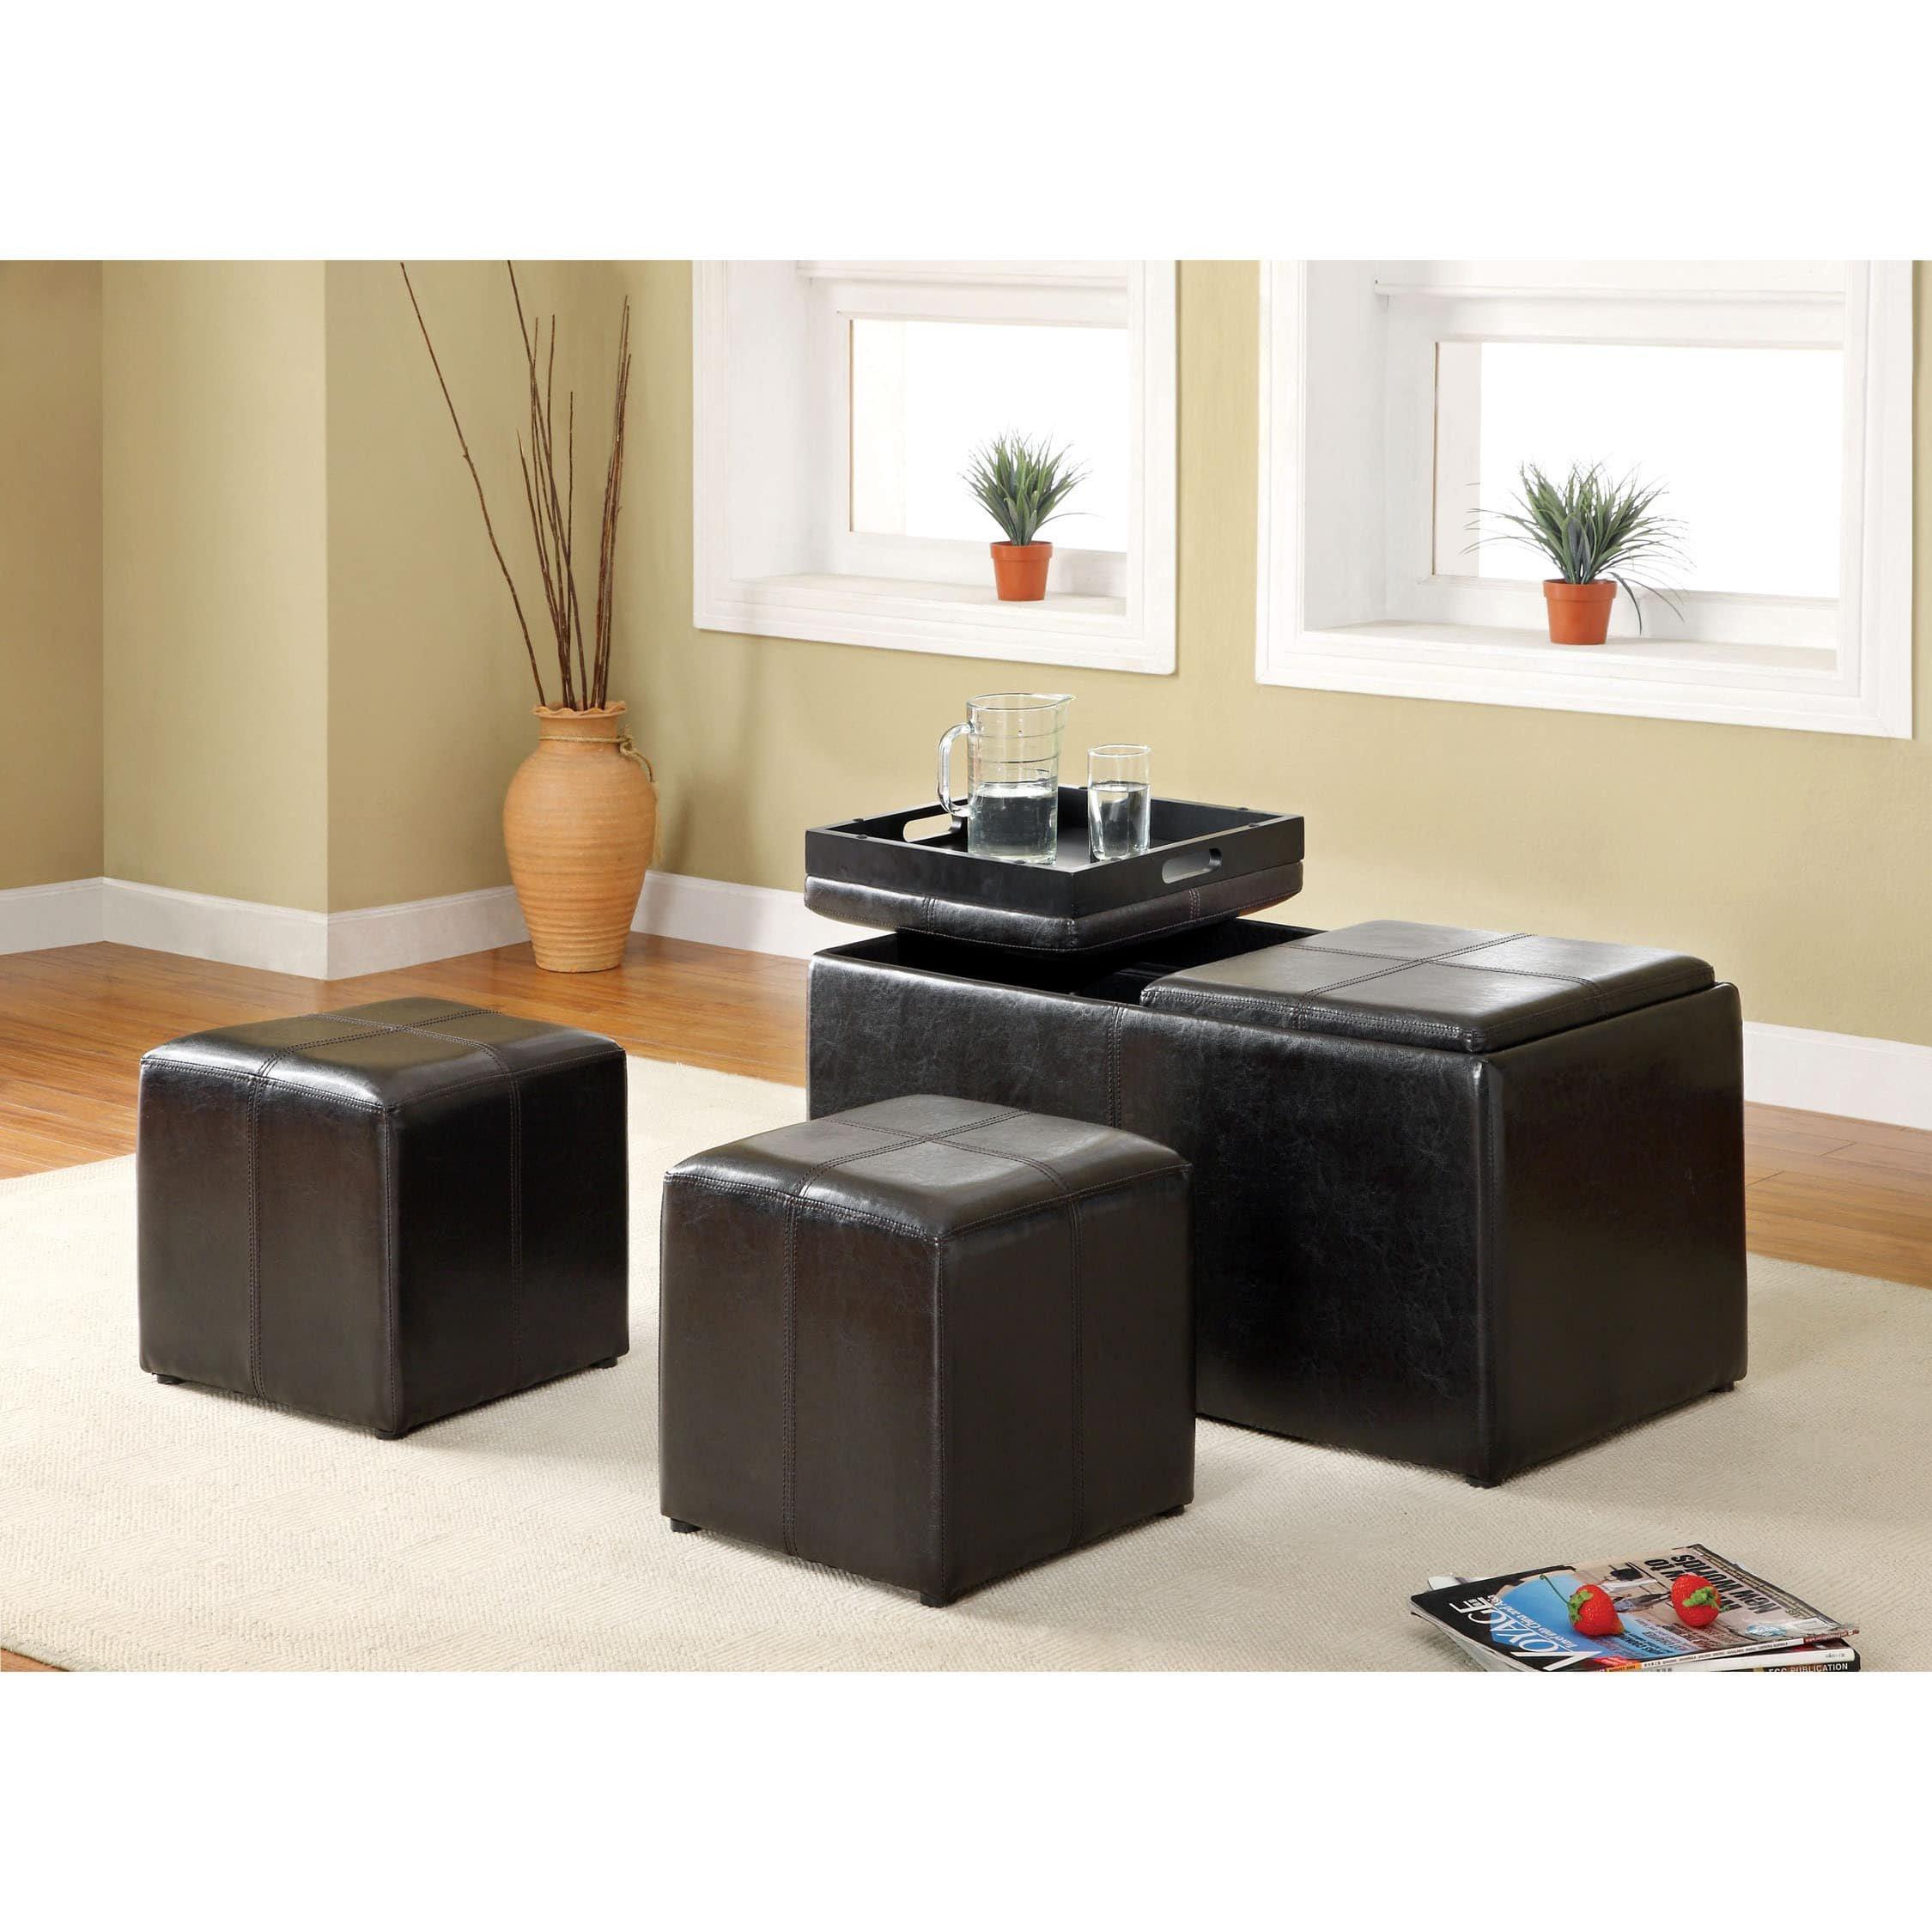 Furniture of America Carline 3-Piece Leatherette Nesting Ottoman Set